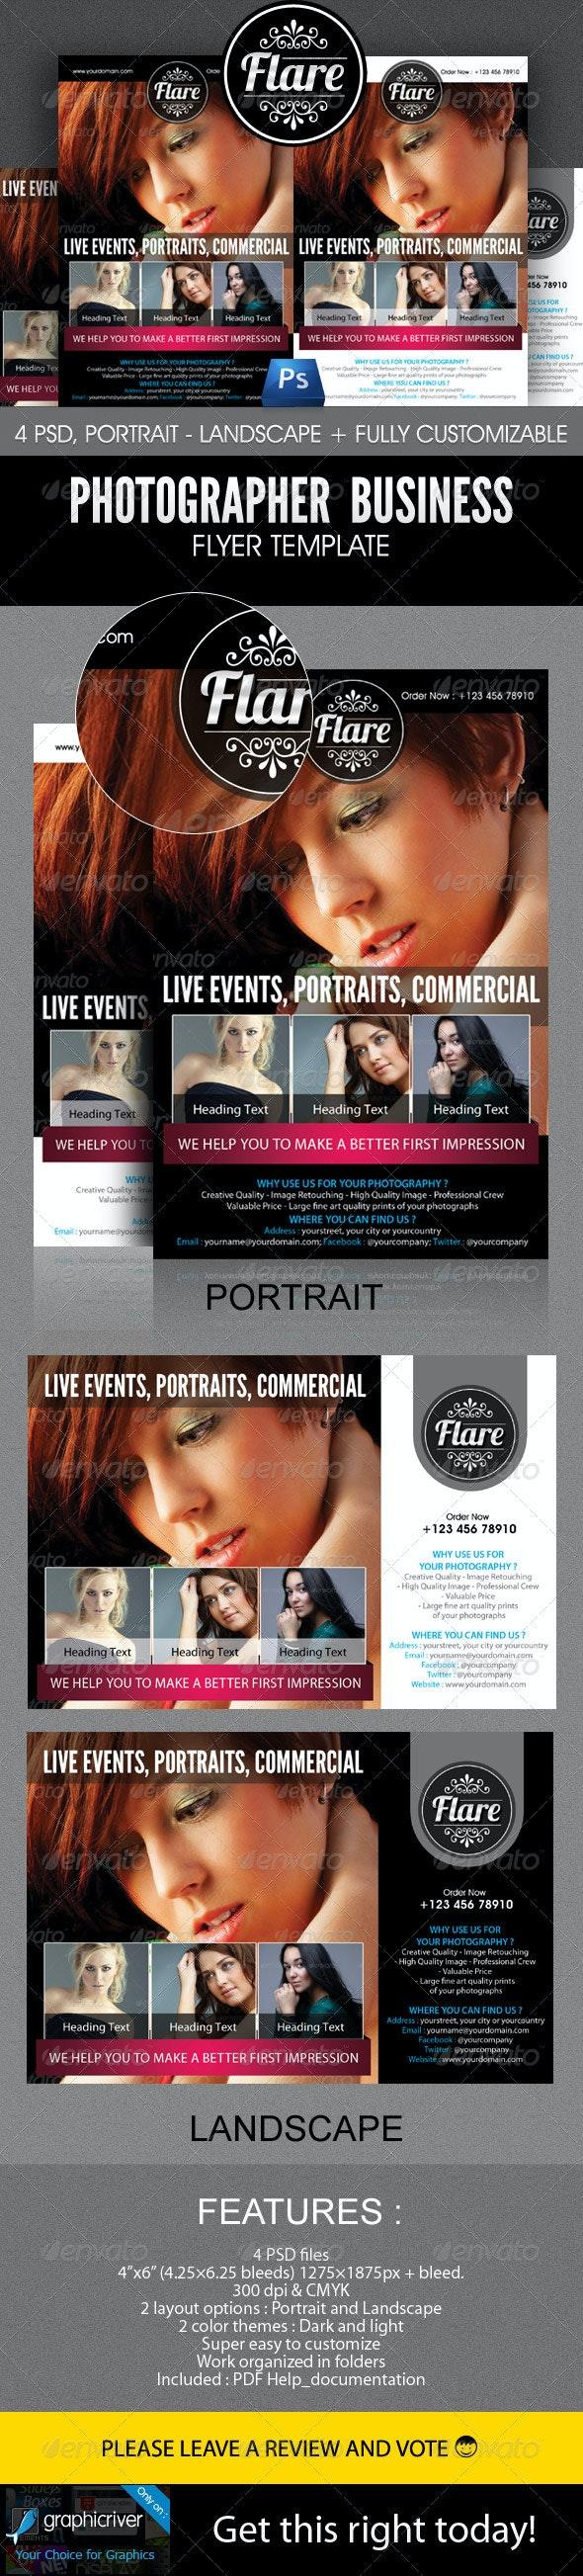 Photographer Business Flyer Template - Flyers Print Templates